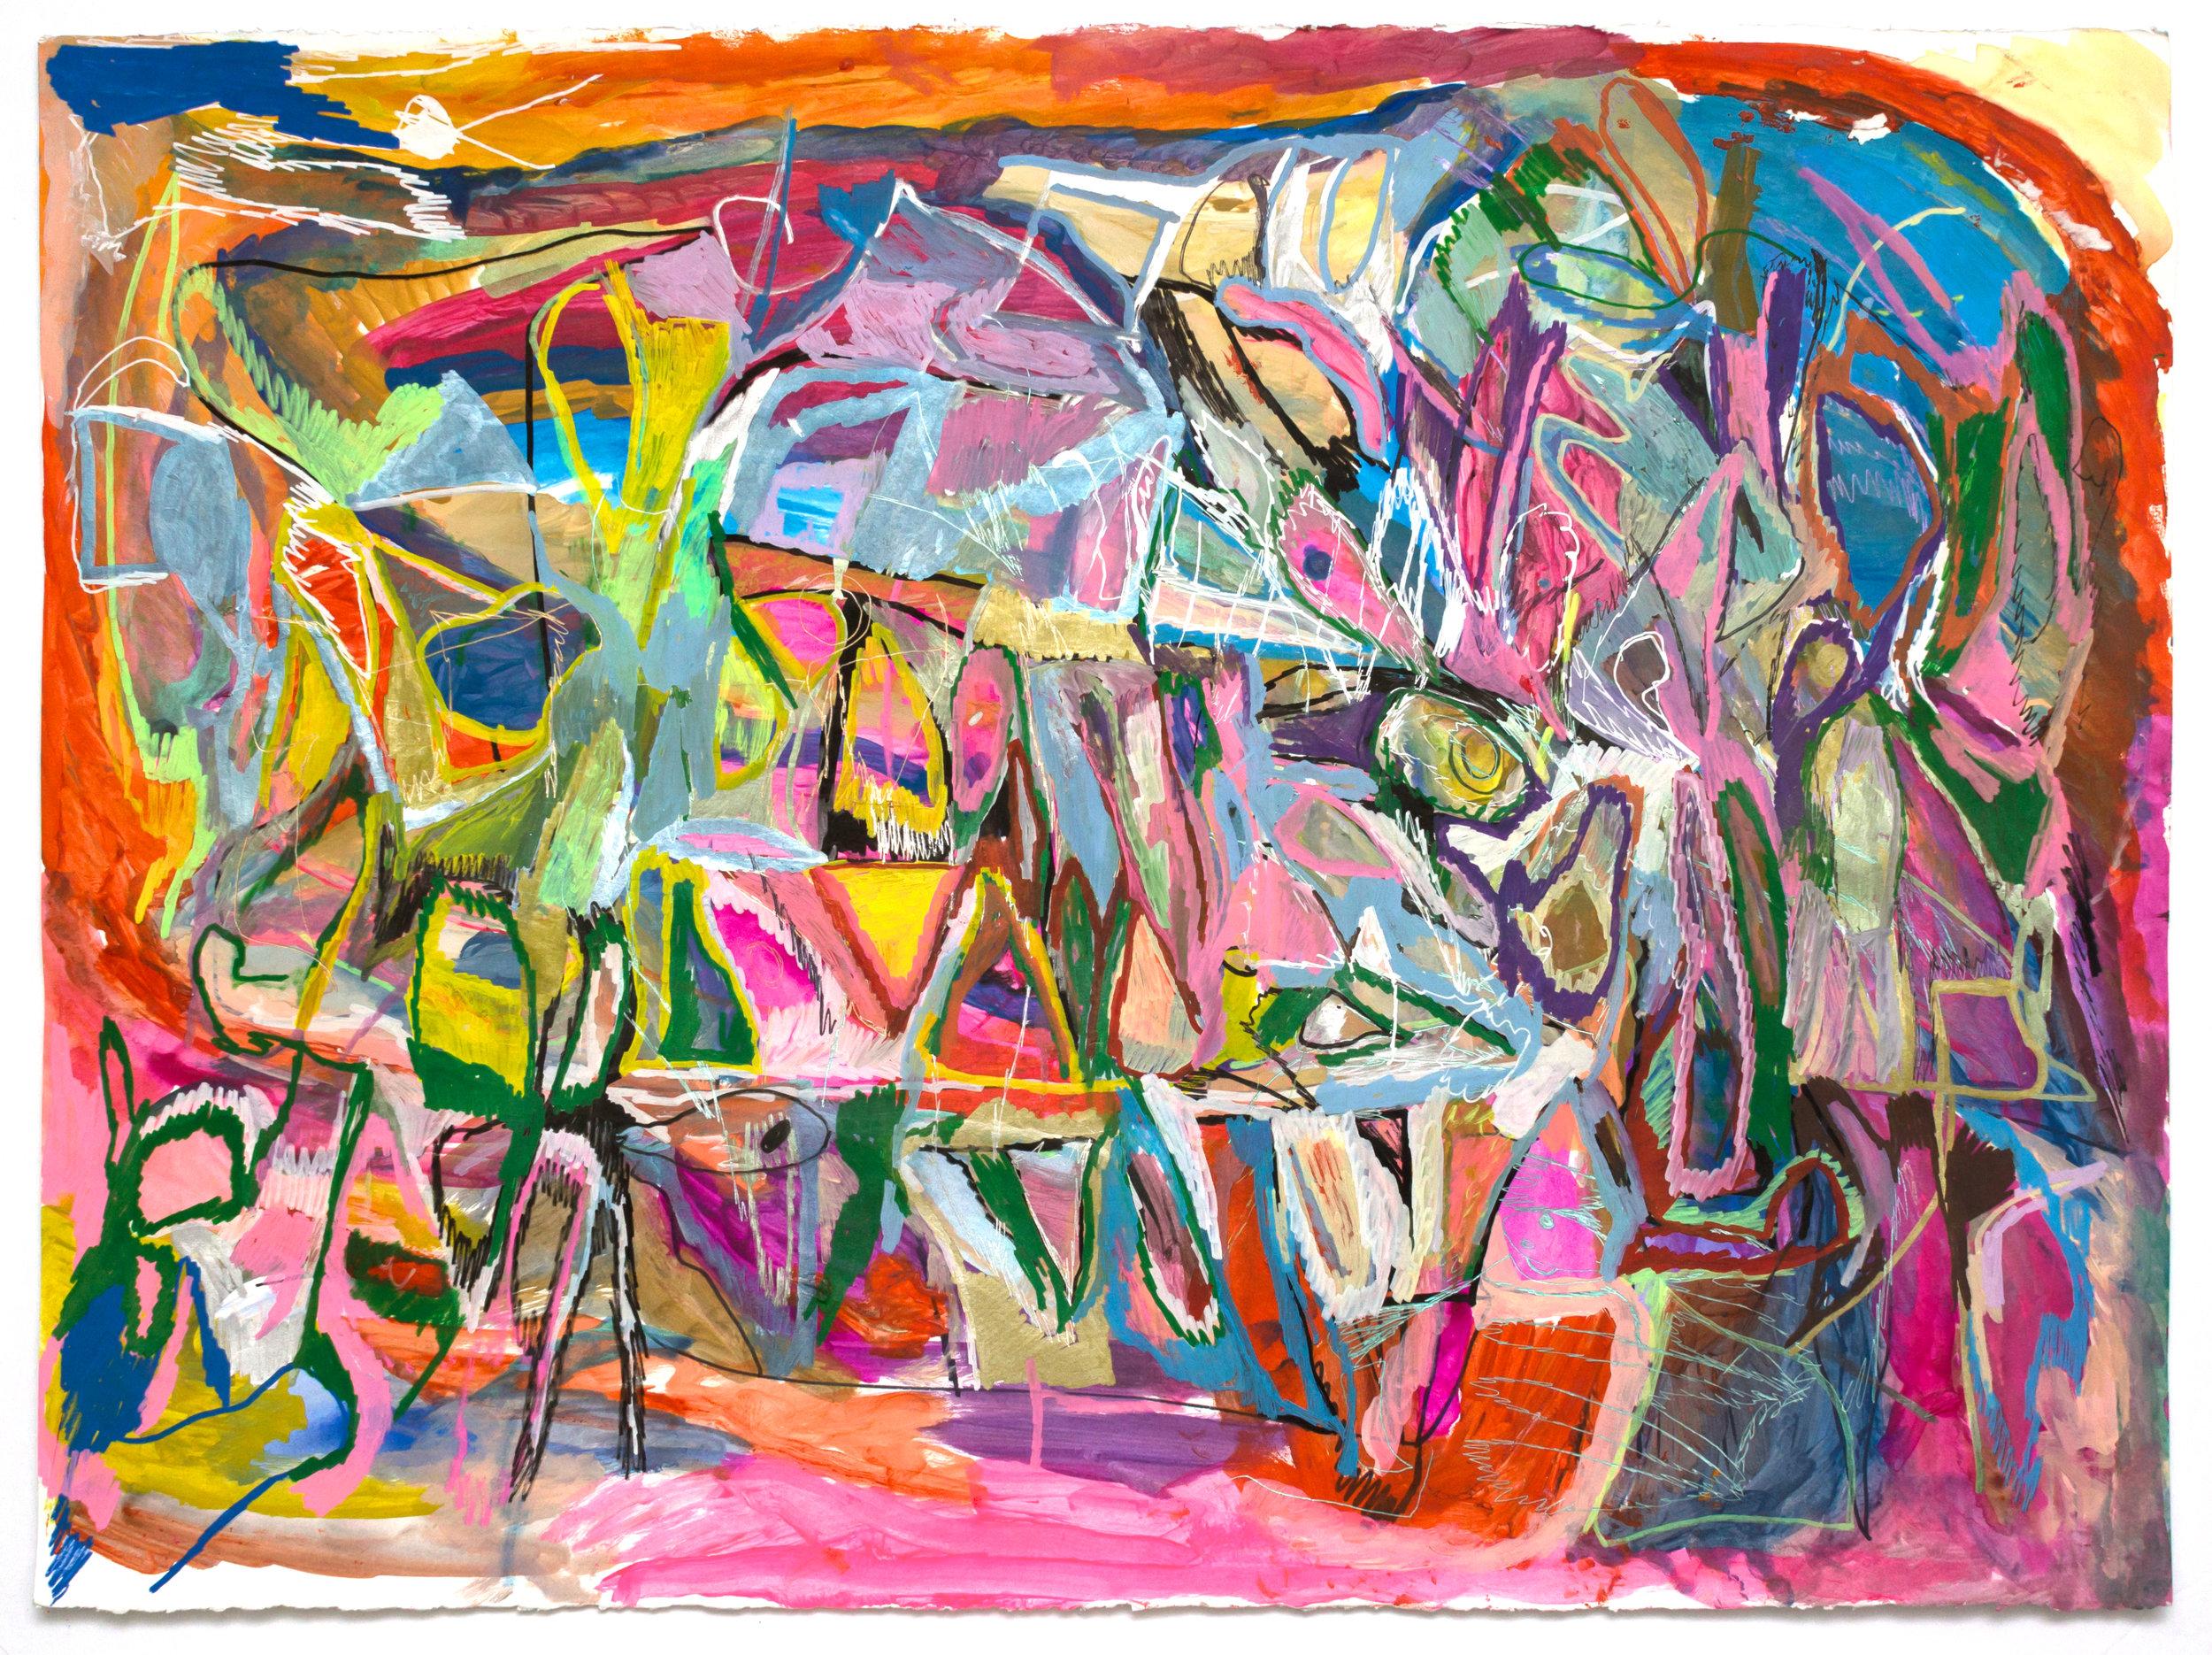 Joseph Alef, Untitled (JA 072), 2018, Work on paper, 22 x 30 inches